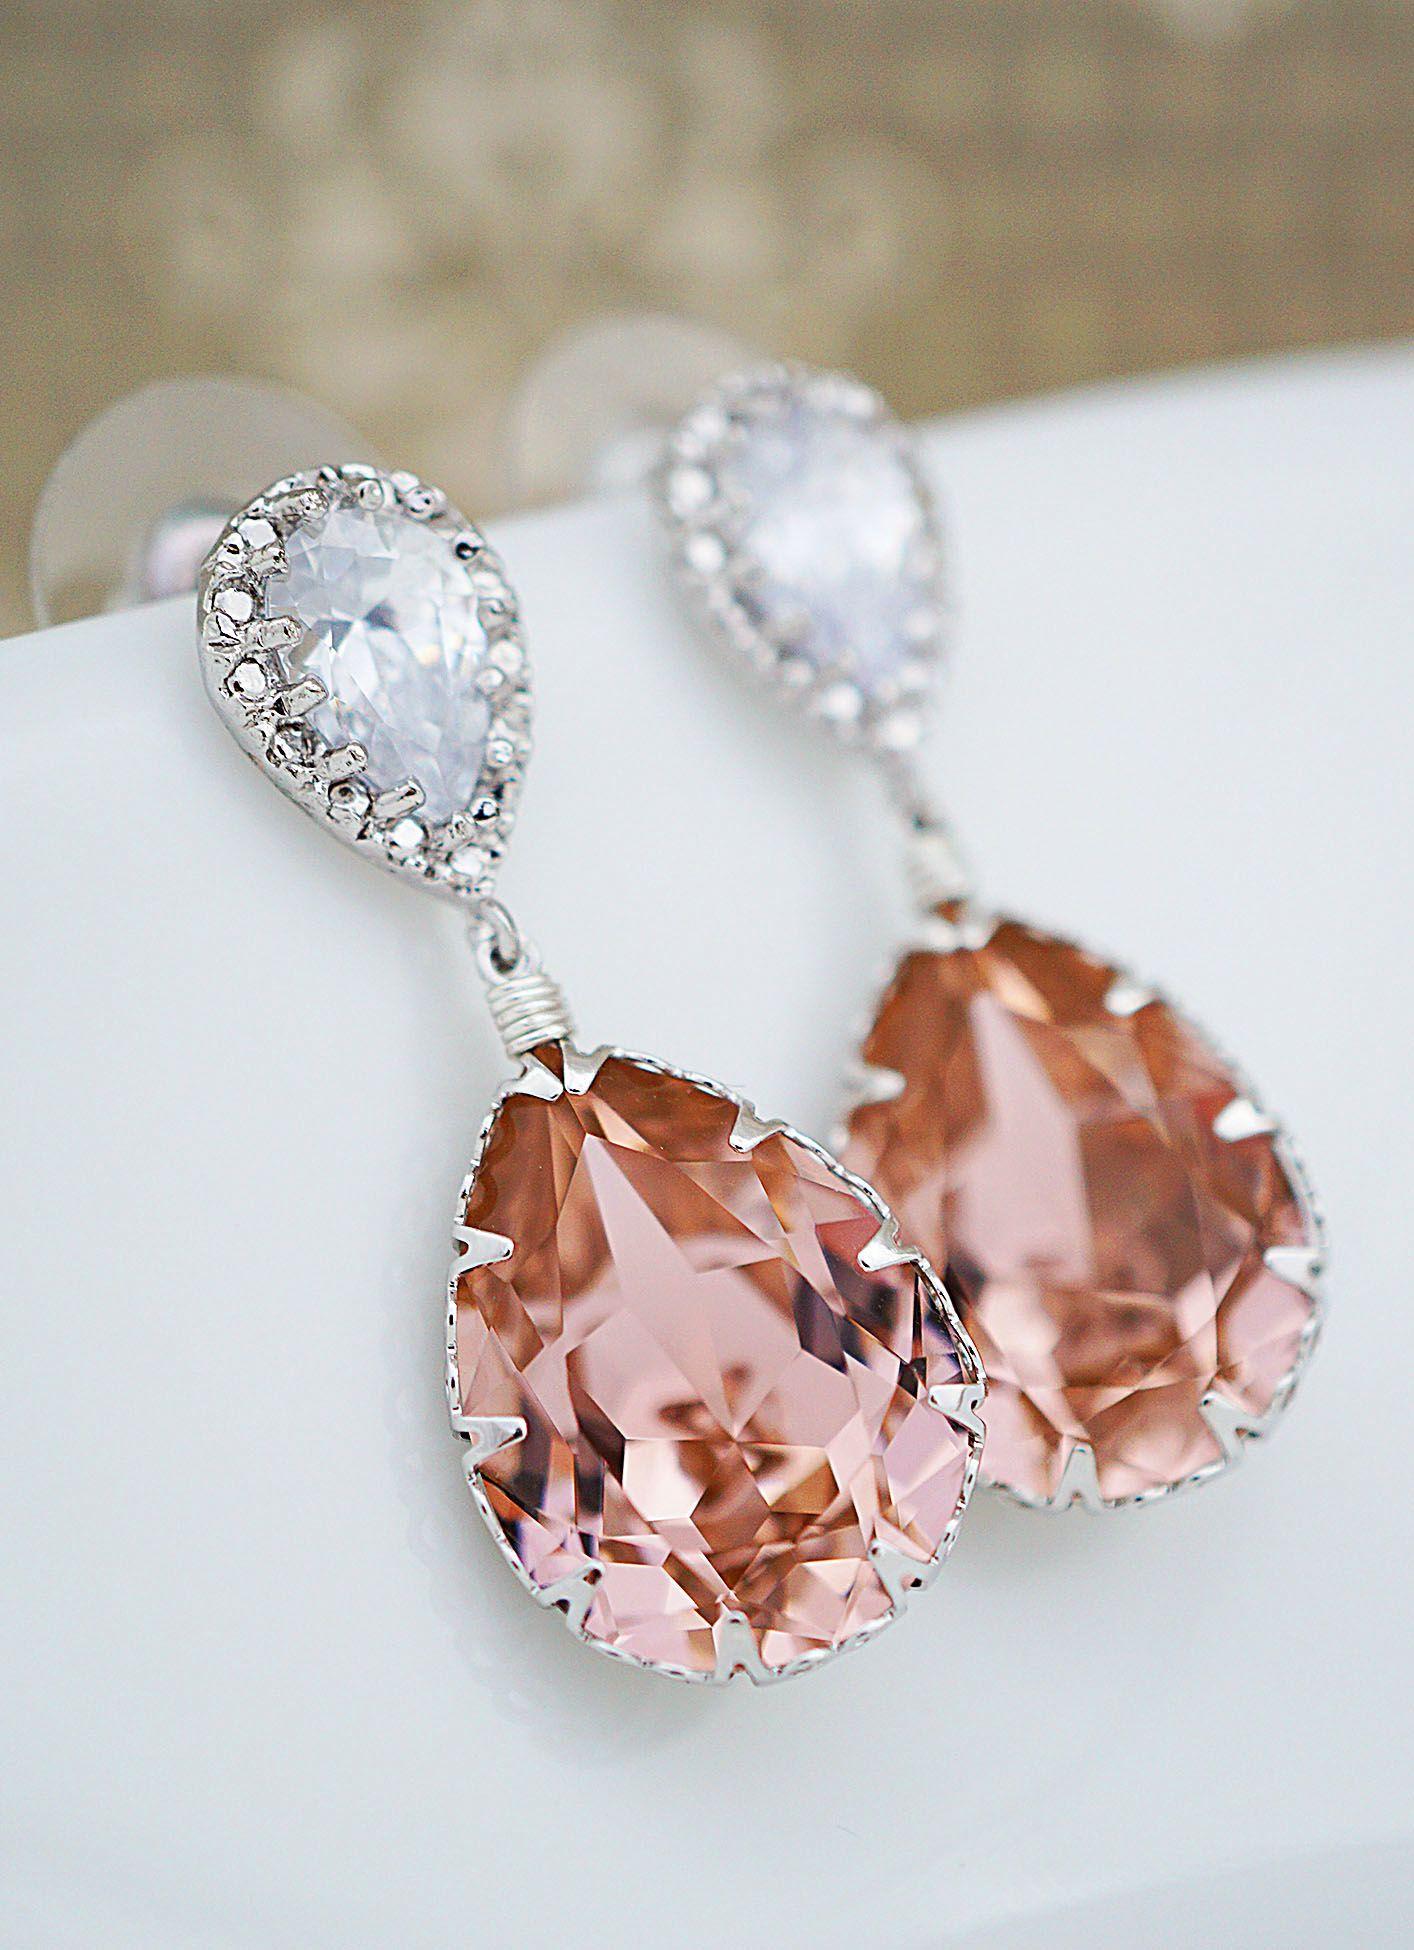 9267eae95 Handmade Vintage rose Swarovski Crystal Earrings from EarringsNation  Bridesmaid Earrings Peach Earrings Peach Weddings Bridal Earrings